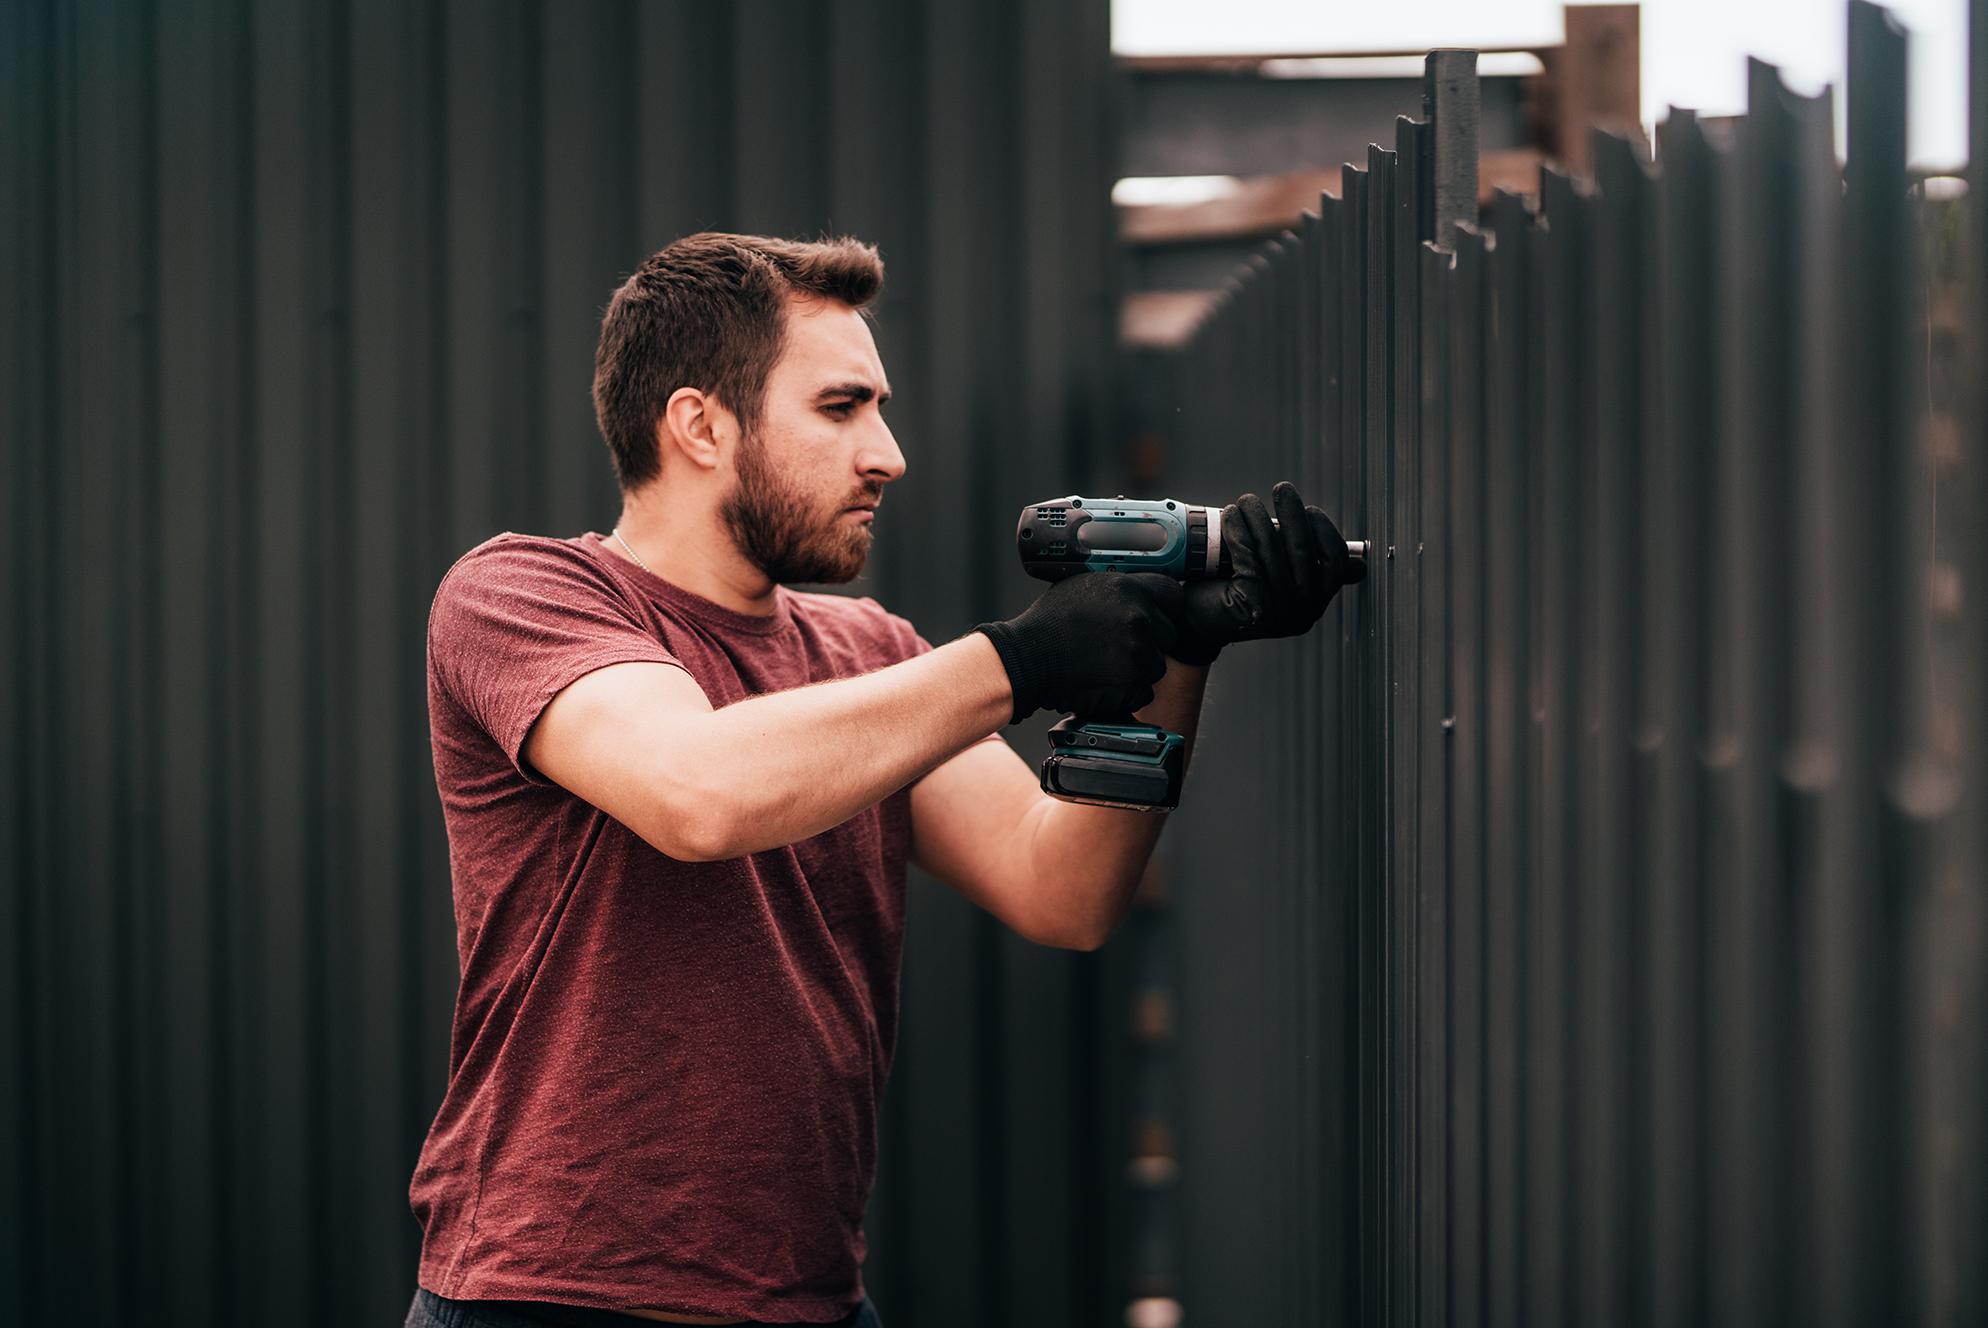 working-man-portrait-construction-worker-using-scr-ZCA3SCF